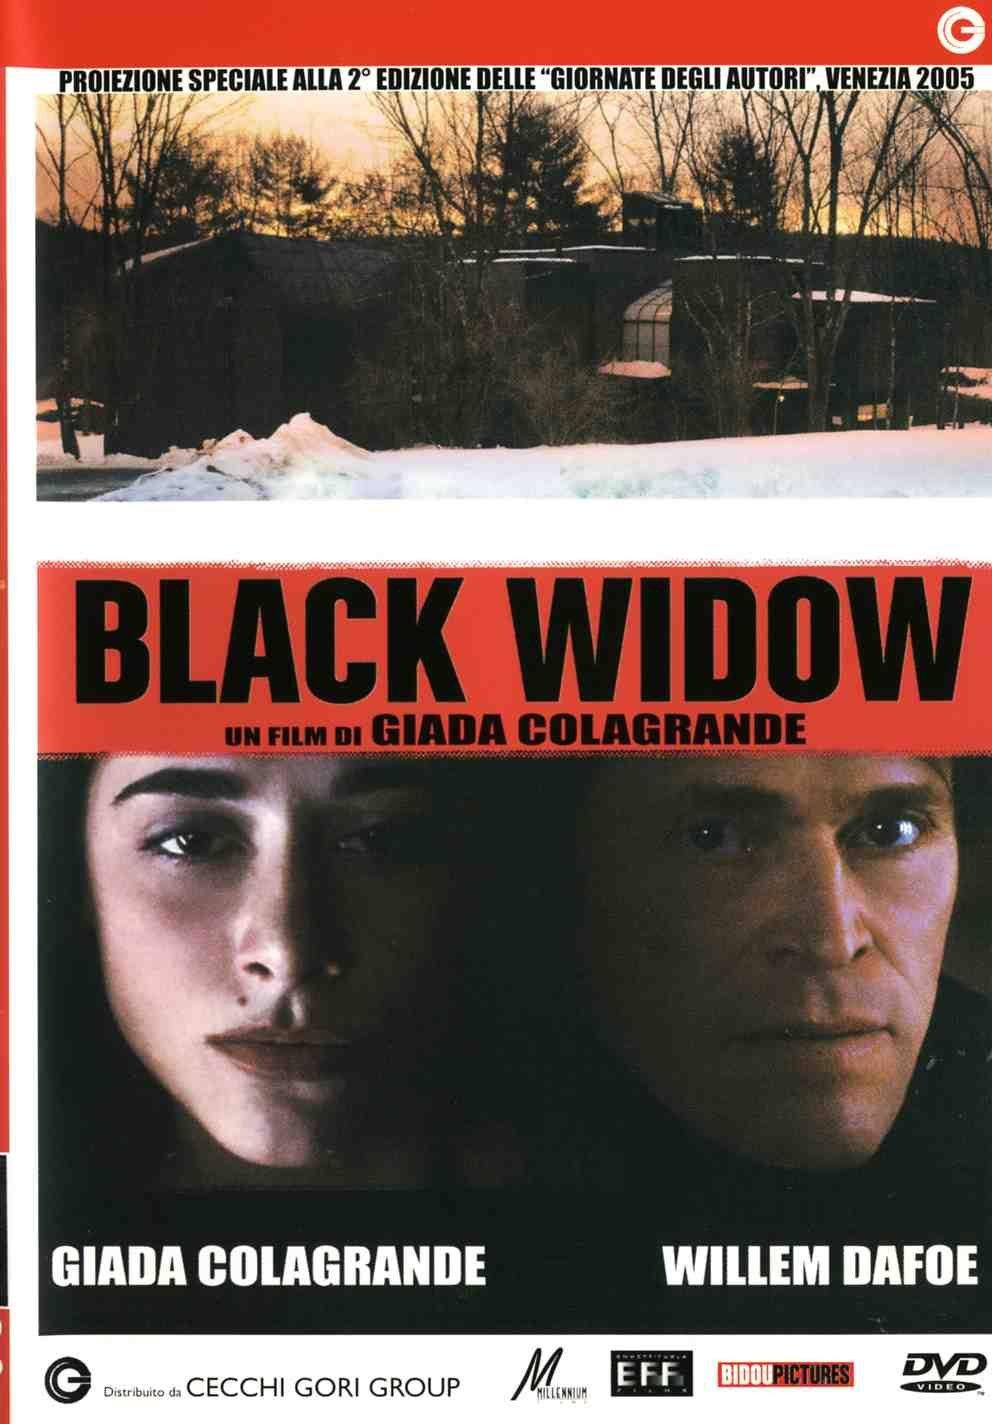 BLACK WIDOW - EX NOLEGGIO (DVD)